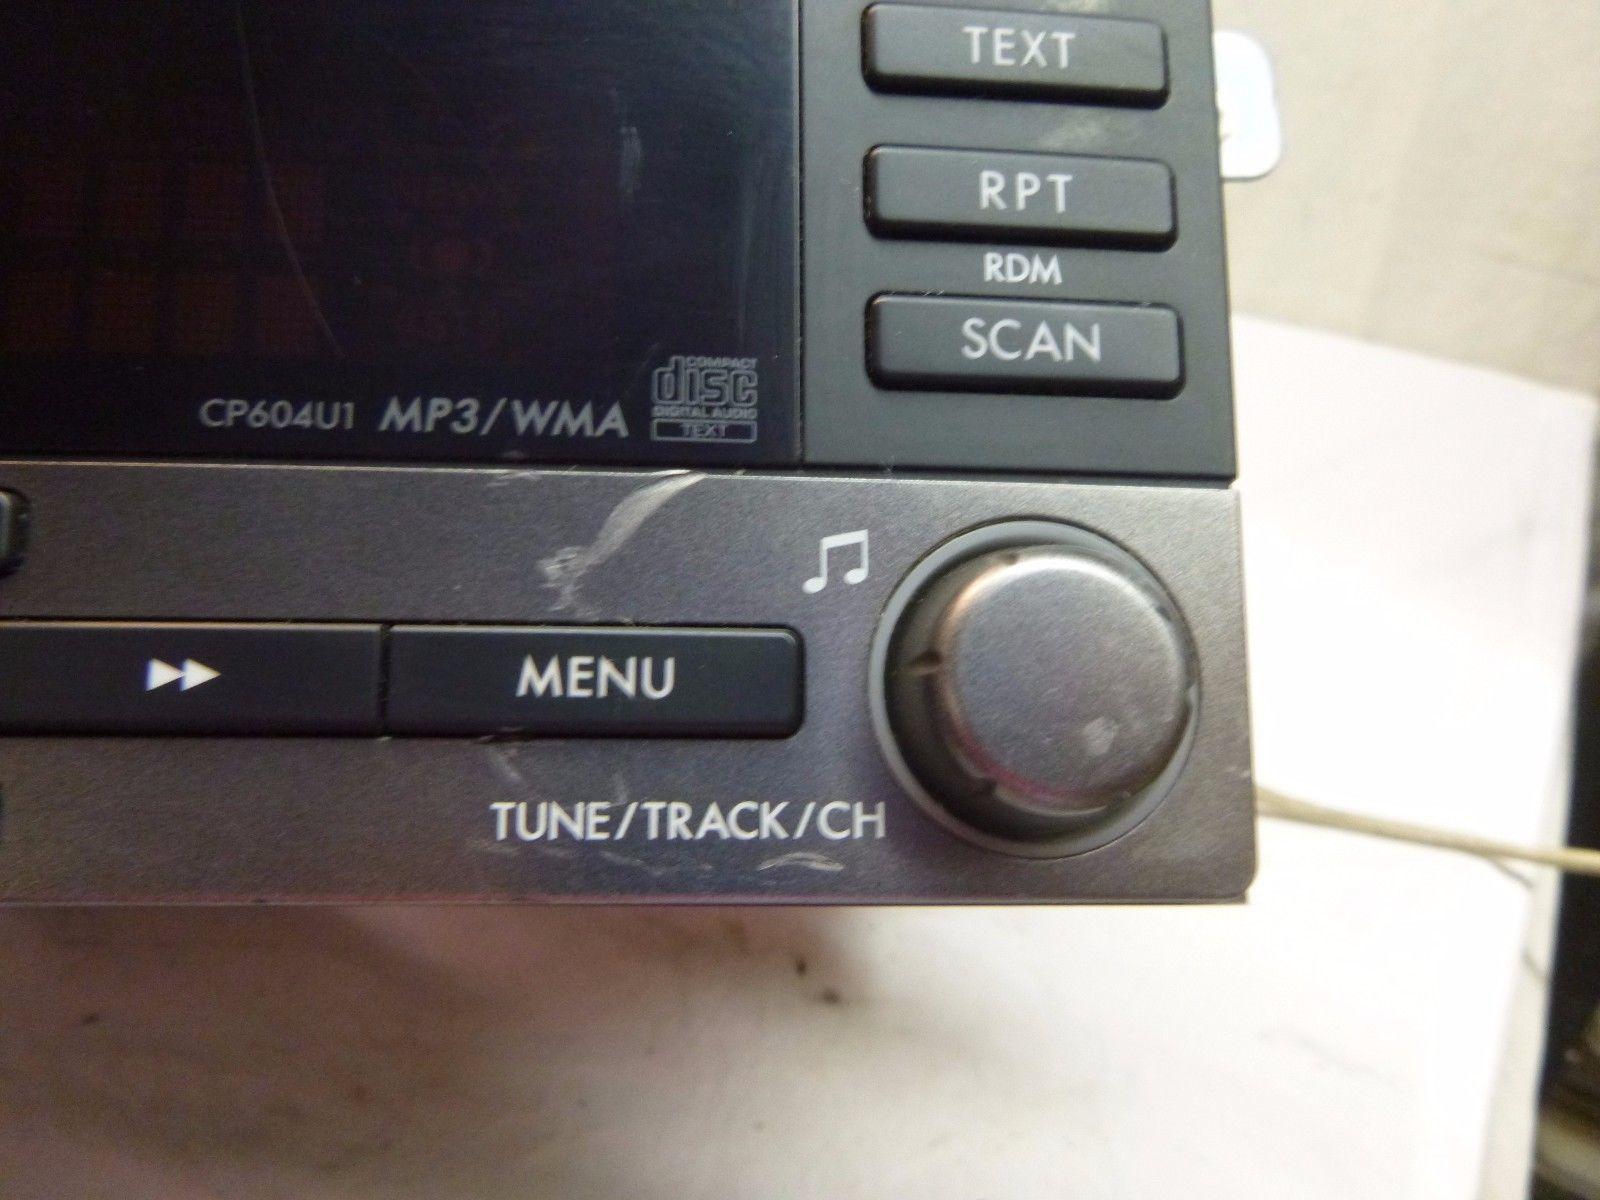 08-11 Subaru Impreza AM FM Radio Cd Mp3 Player 86201SC600 CP603U1 UTB572